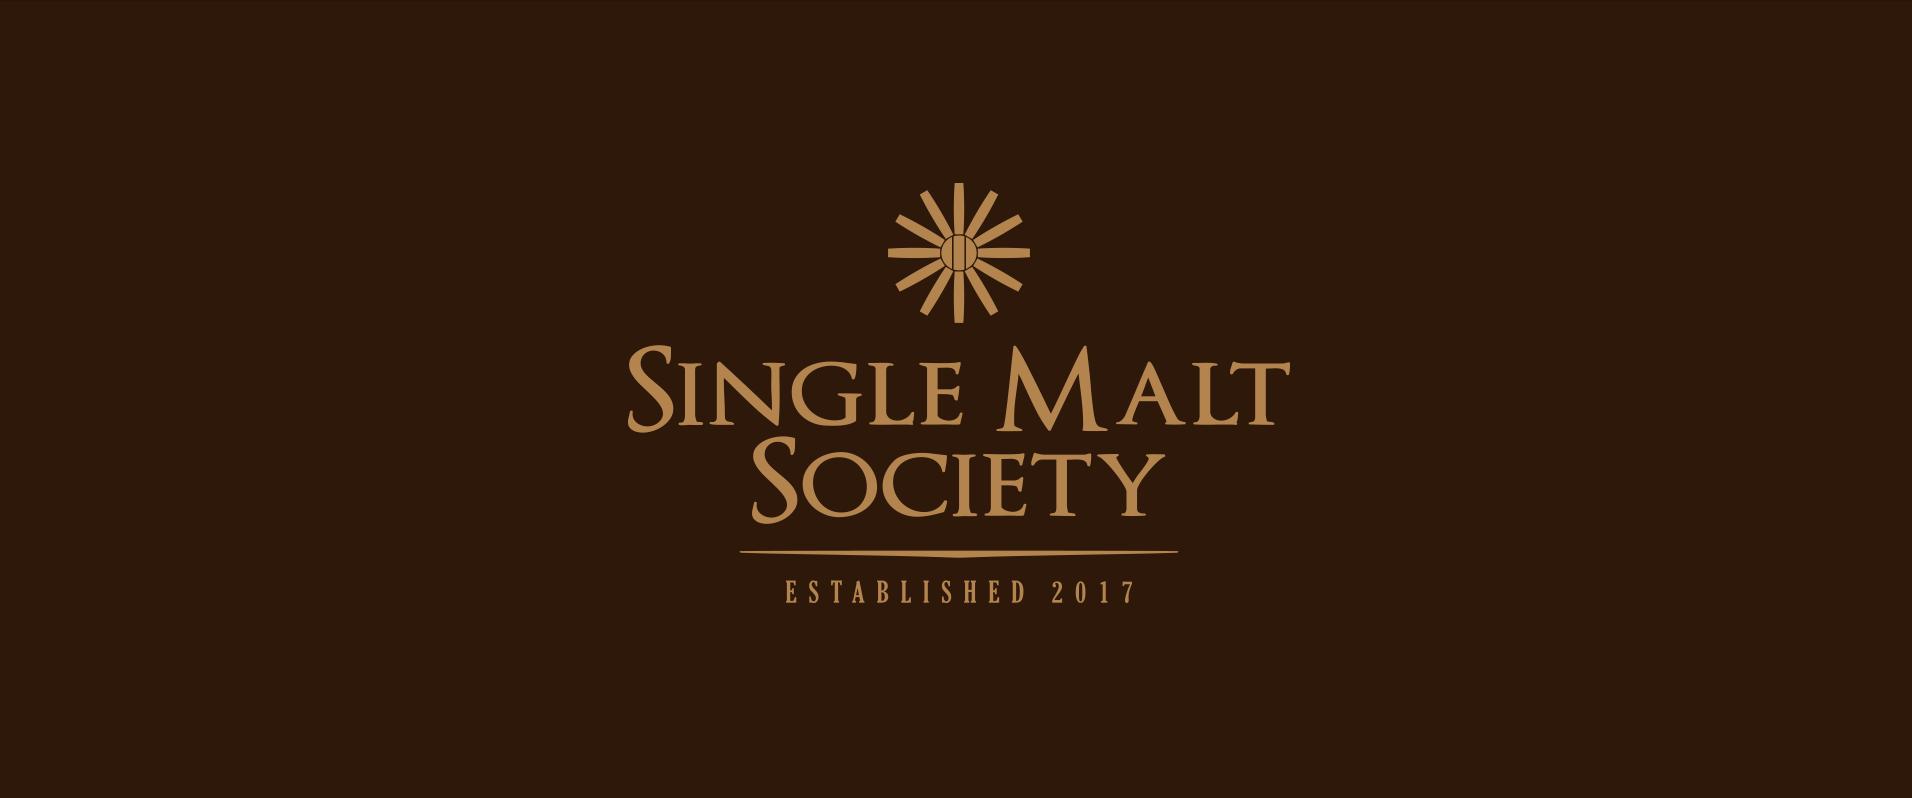 Despre Single Malt Society